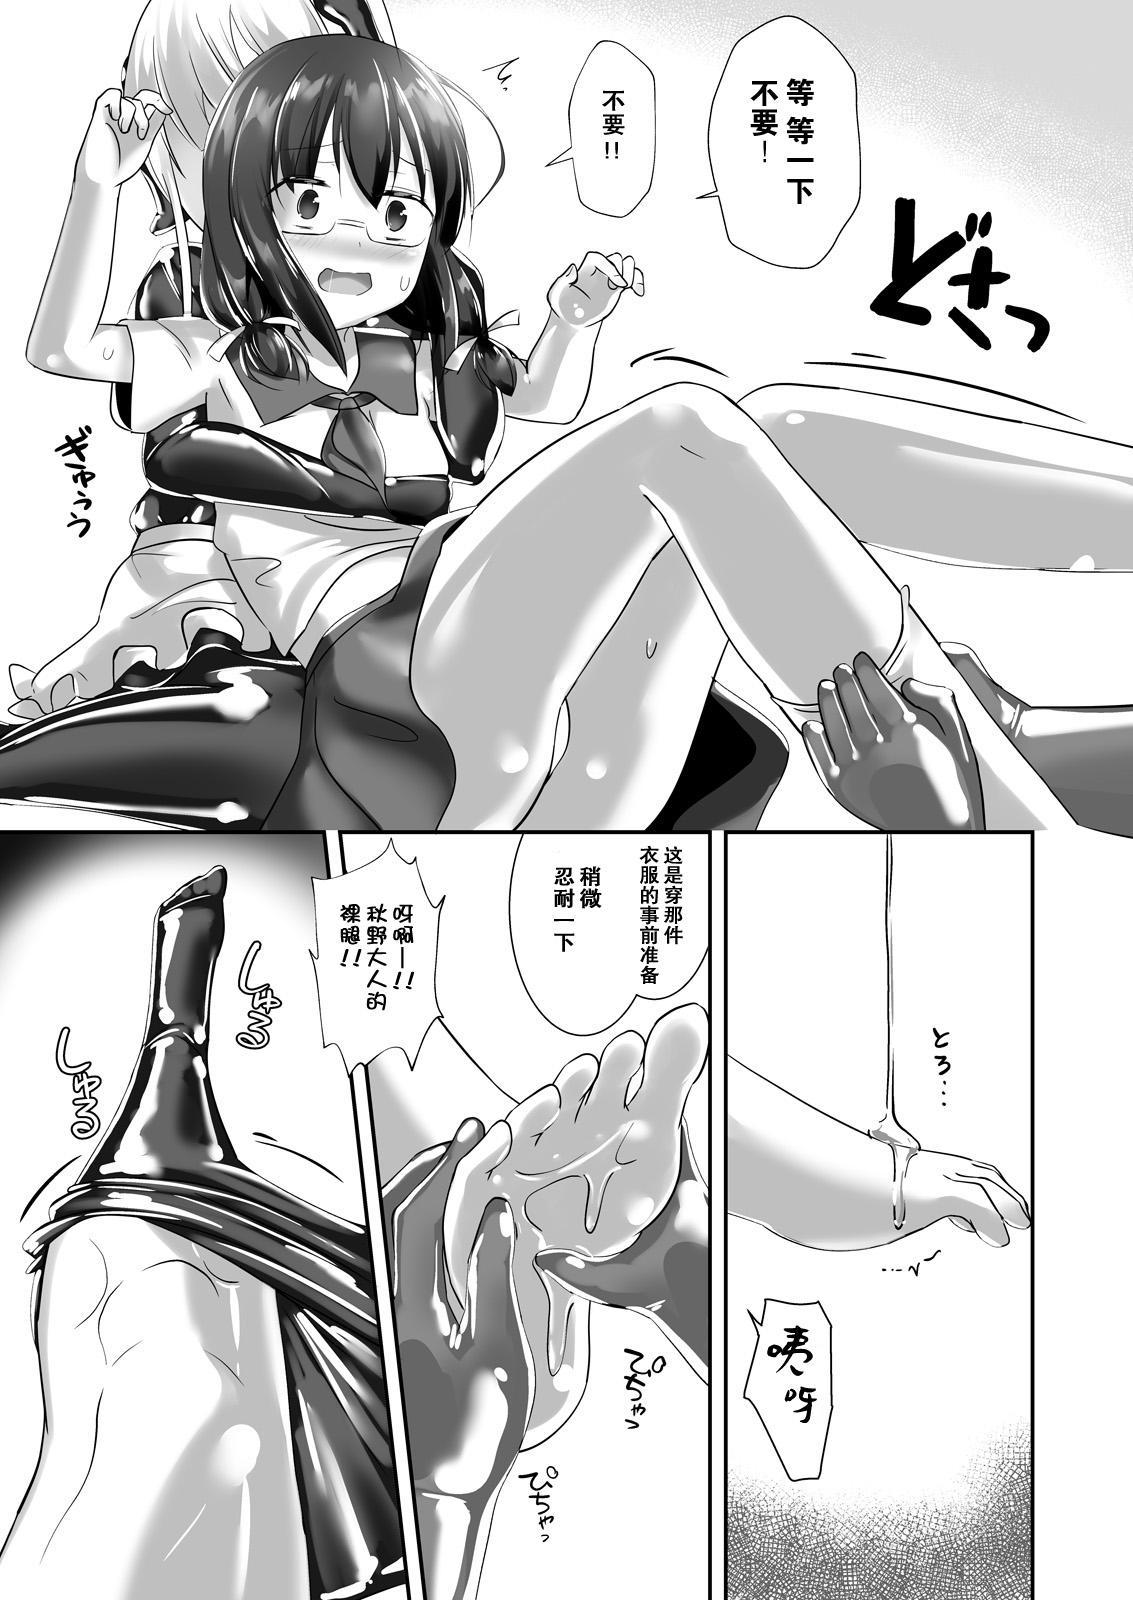 Yumewatari no Mistress night 5 15